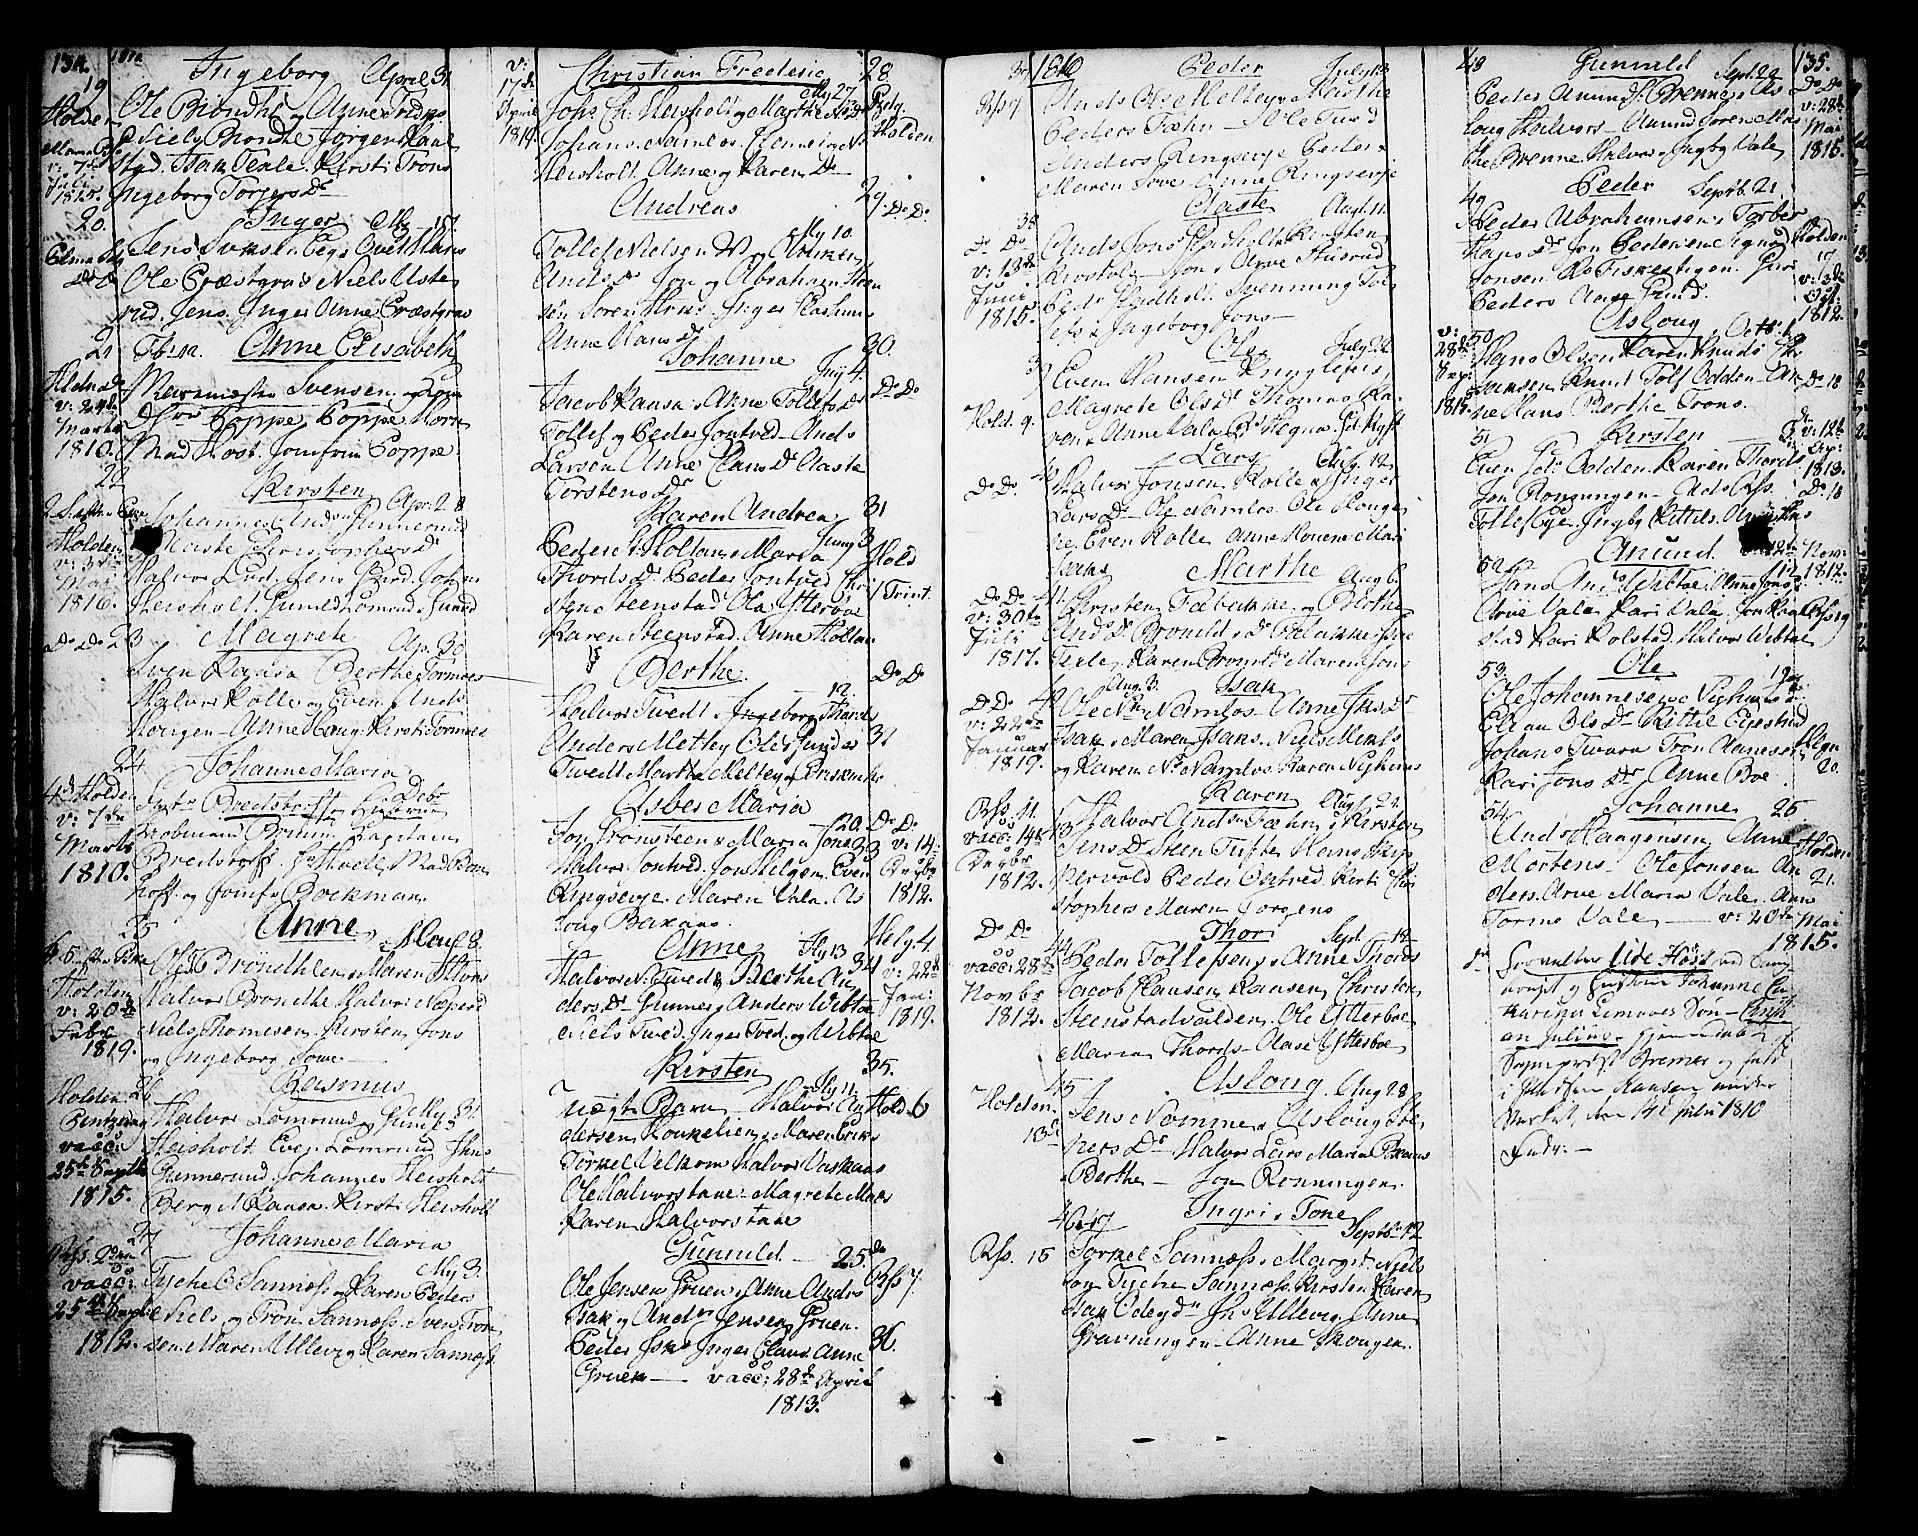 SAKO, Holla kirkebøker, F/Fa/L0002: Ministerialbok nr. 2, 1779-1814, s. 134-135